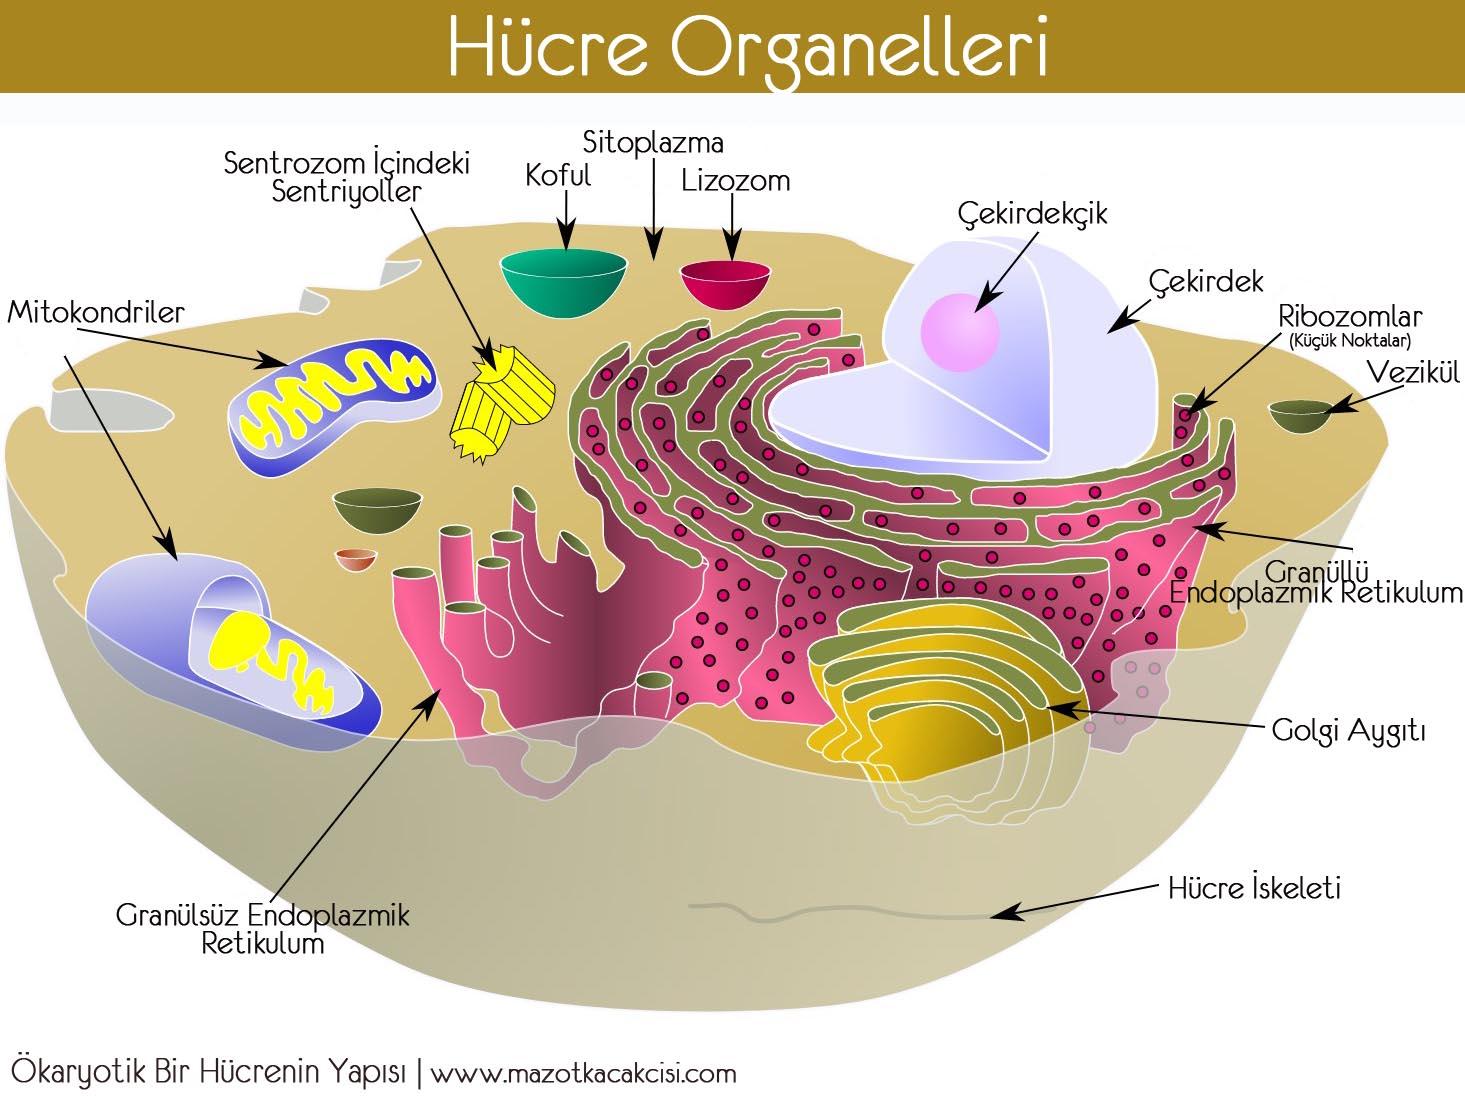 Organeller ... Fonksiyonlar, organellerin yapısı